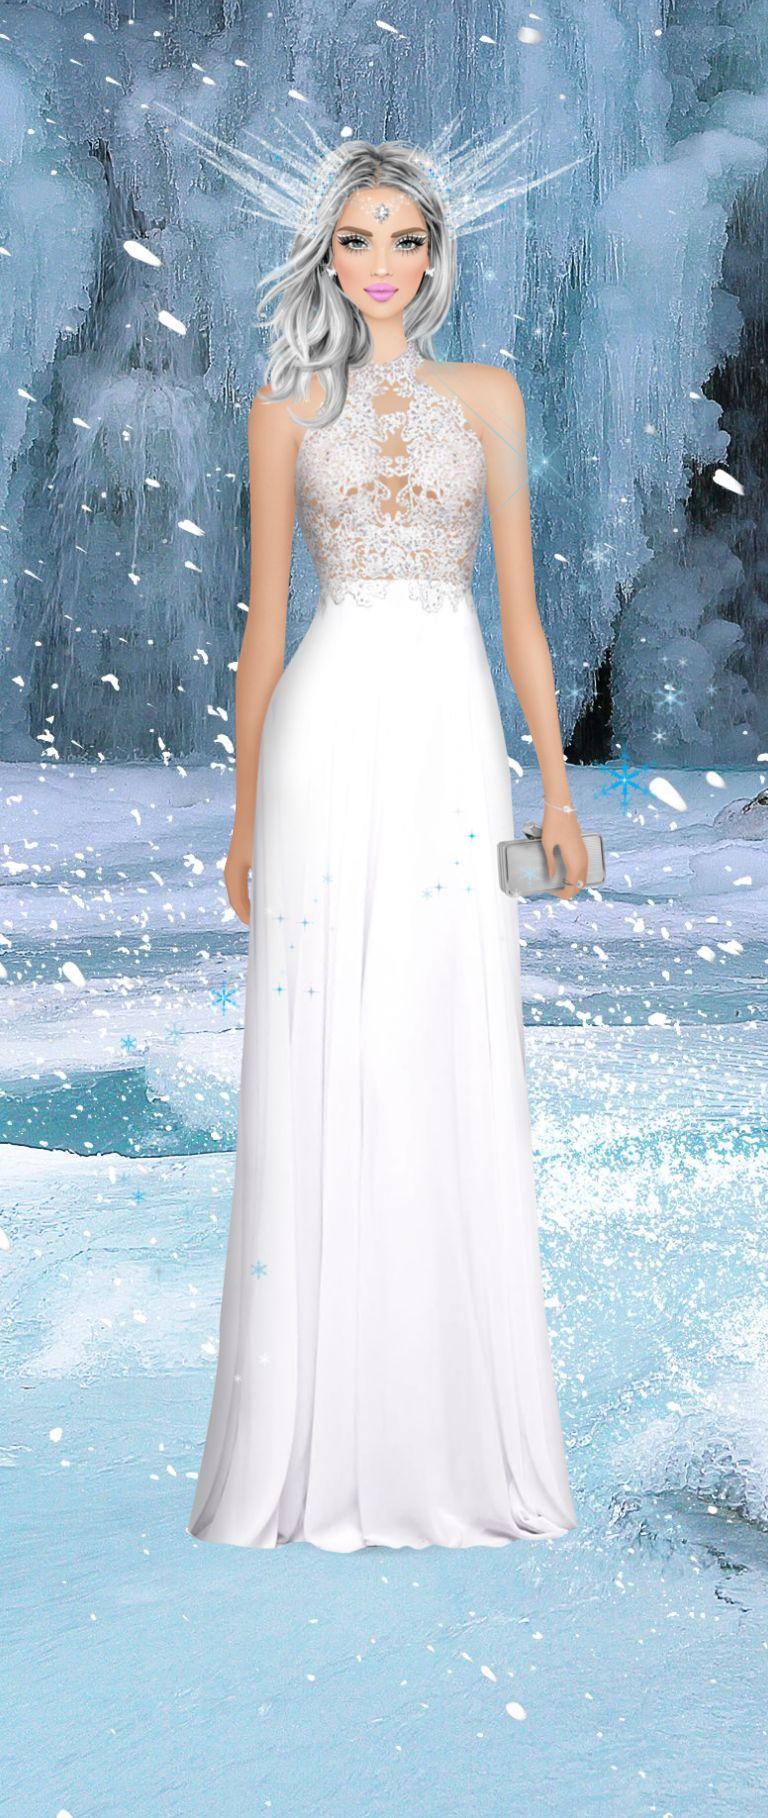 The Frozen Falls | mi vestido | Pinterest | Moda elegante ...